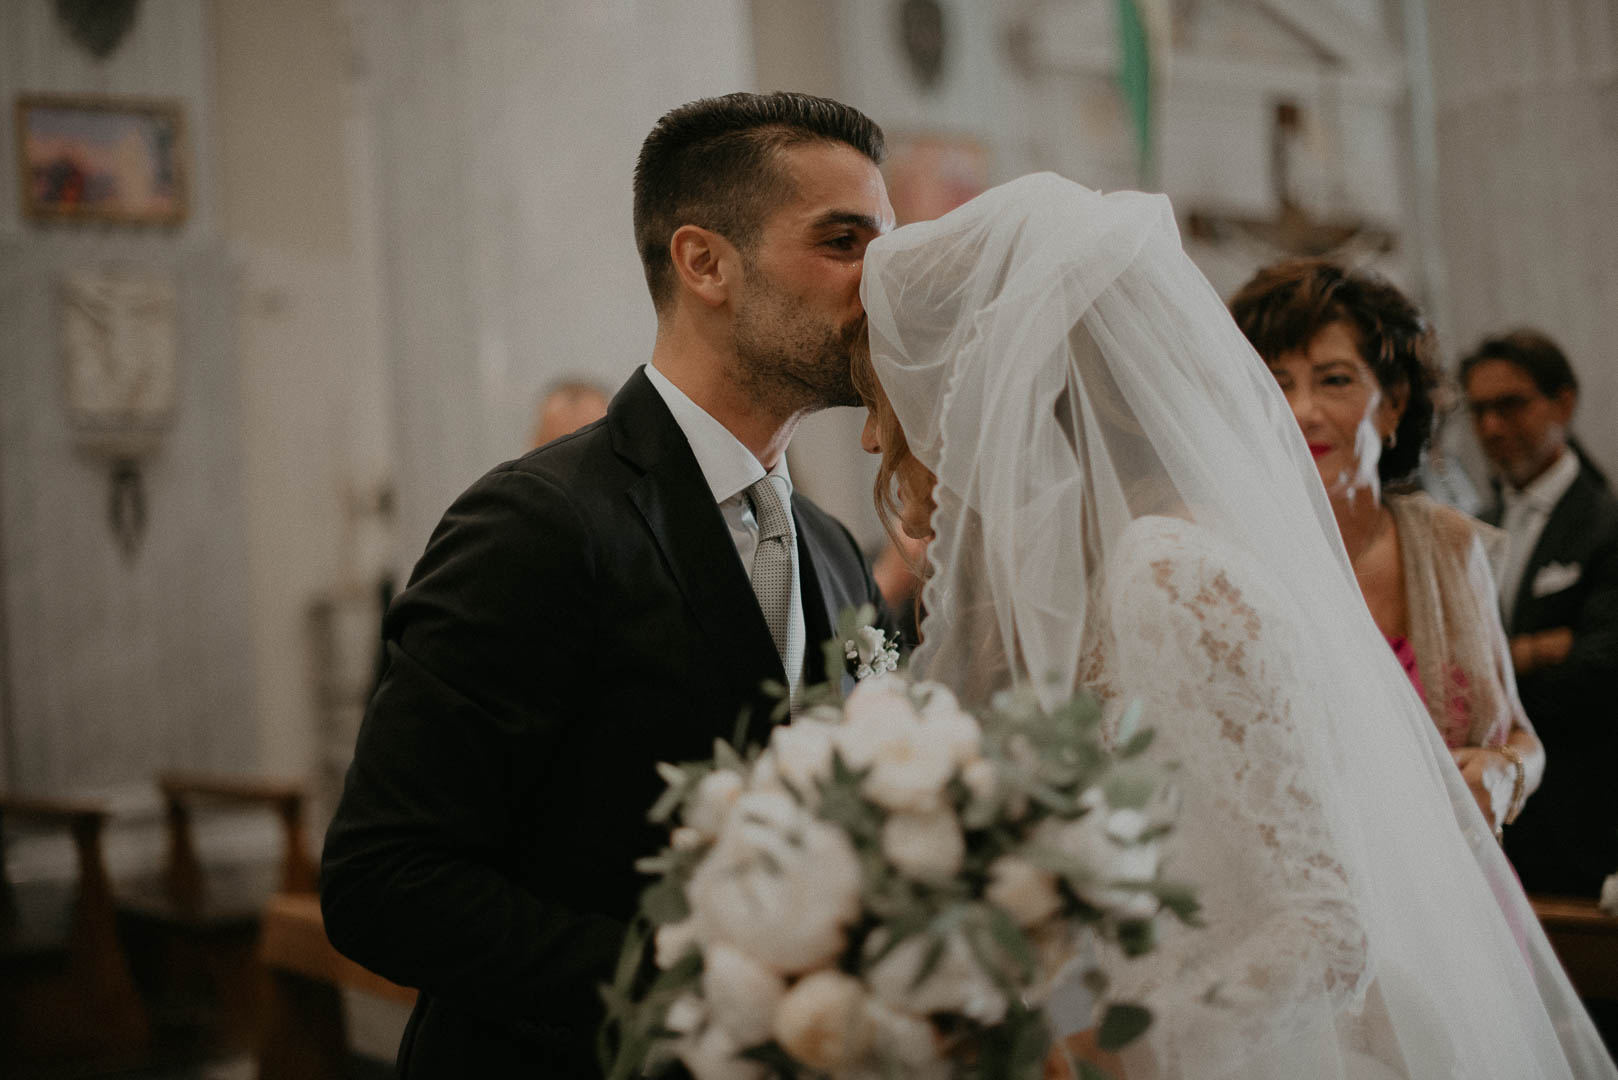 wedding-photographer-destination-fineart-bespoke-reportage-napoli-nabilah-vivianeizzo-spazio46-61